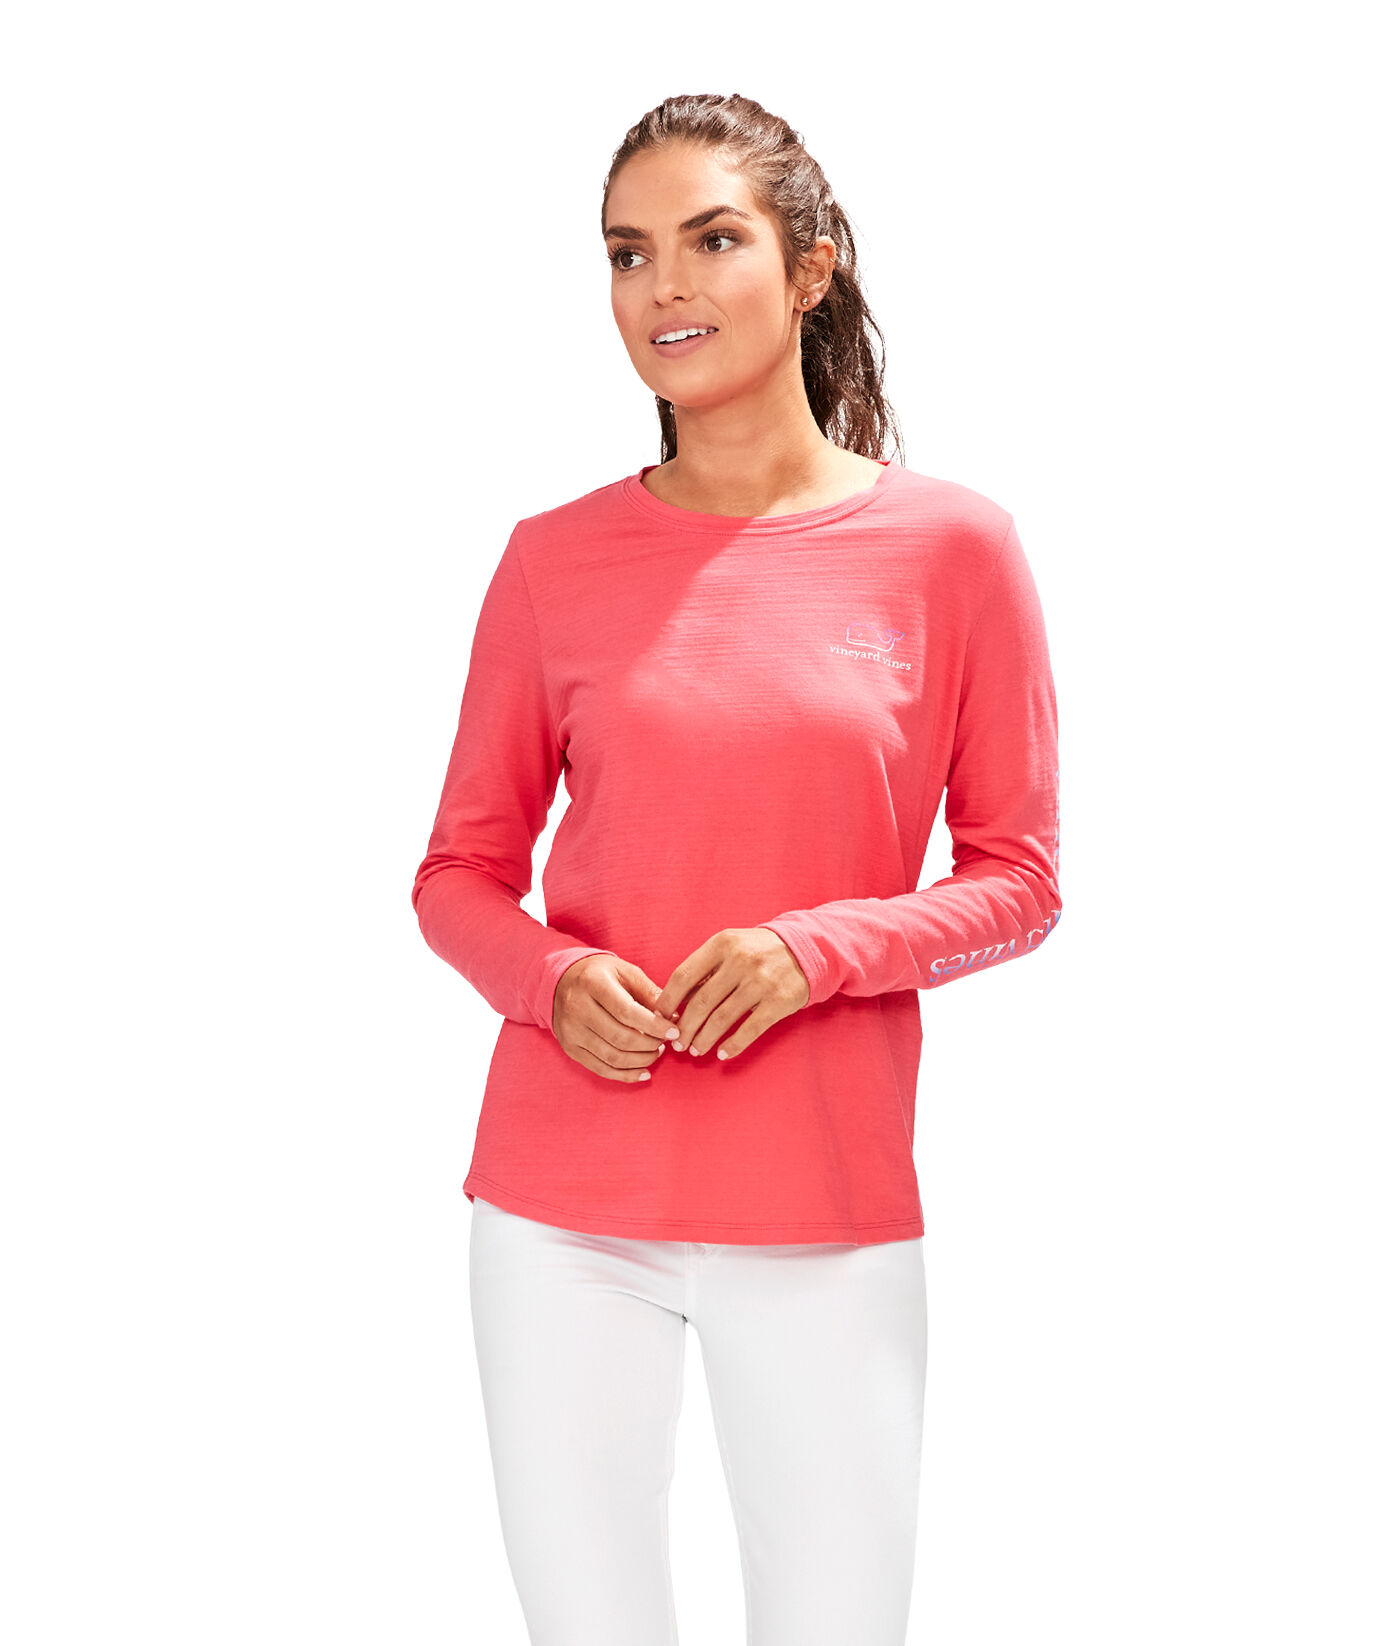 Vineyard Vines Women/'s S//S Crystal Blue V-Neck Slub T-Shirt